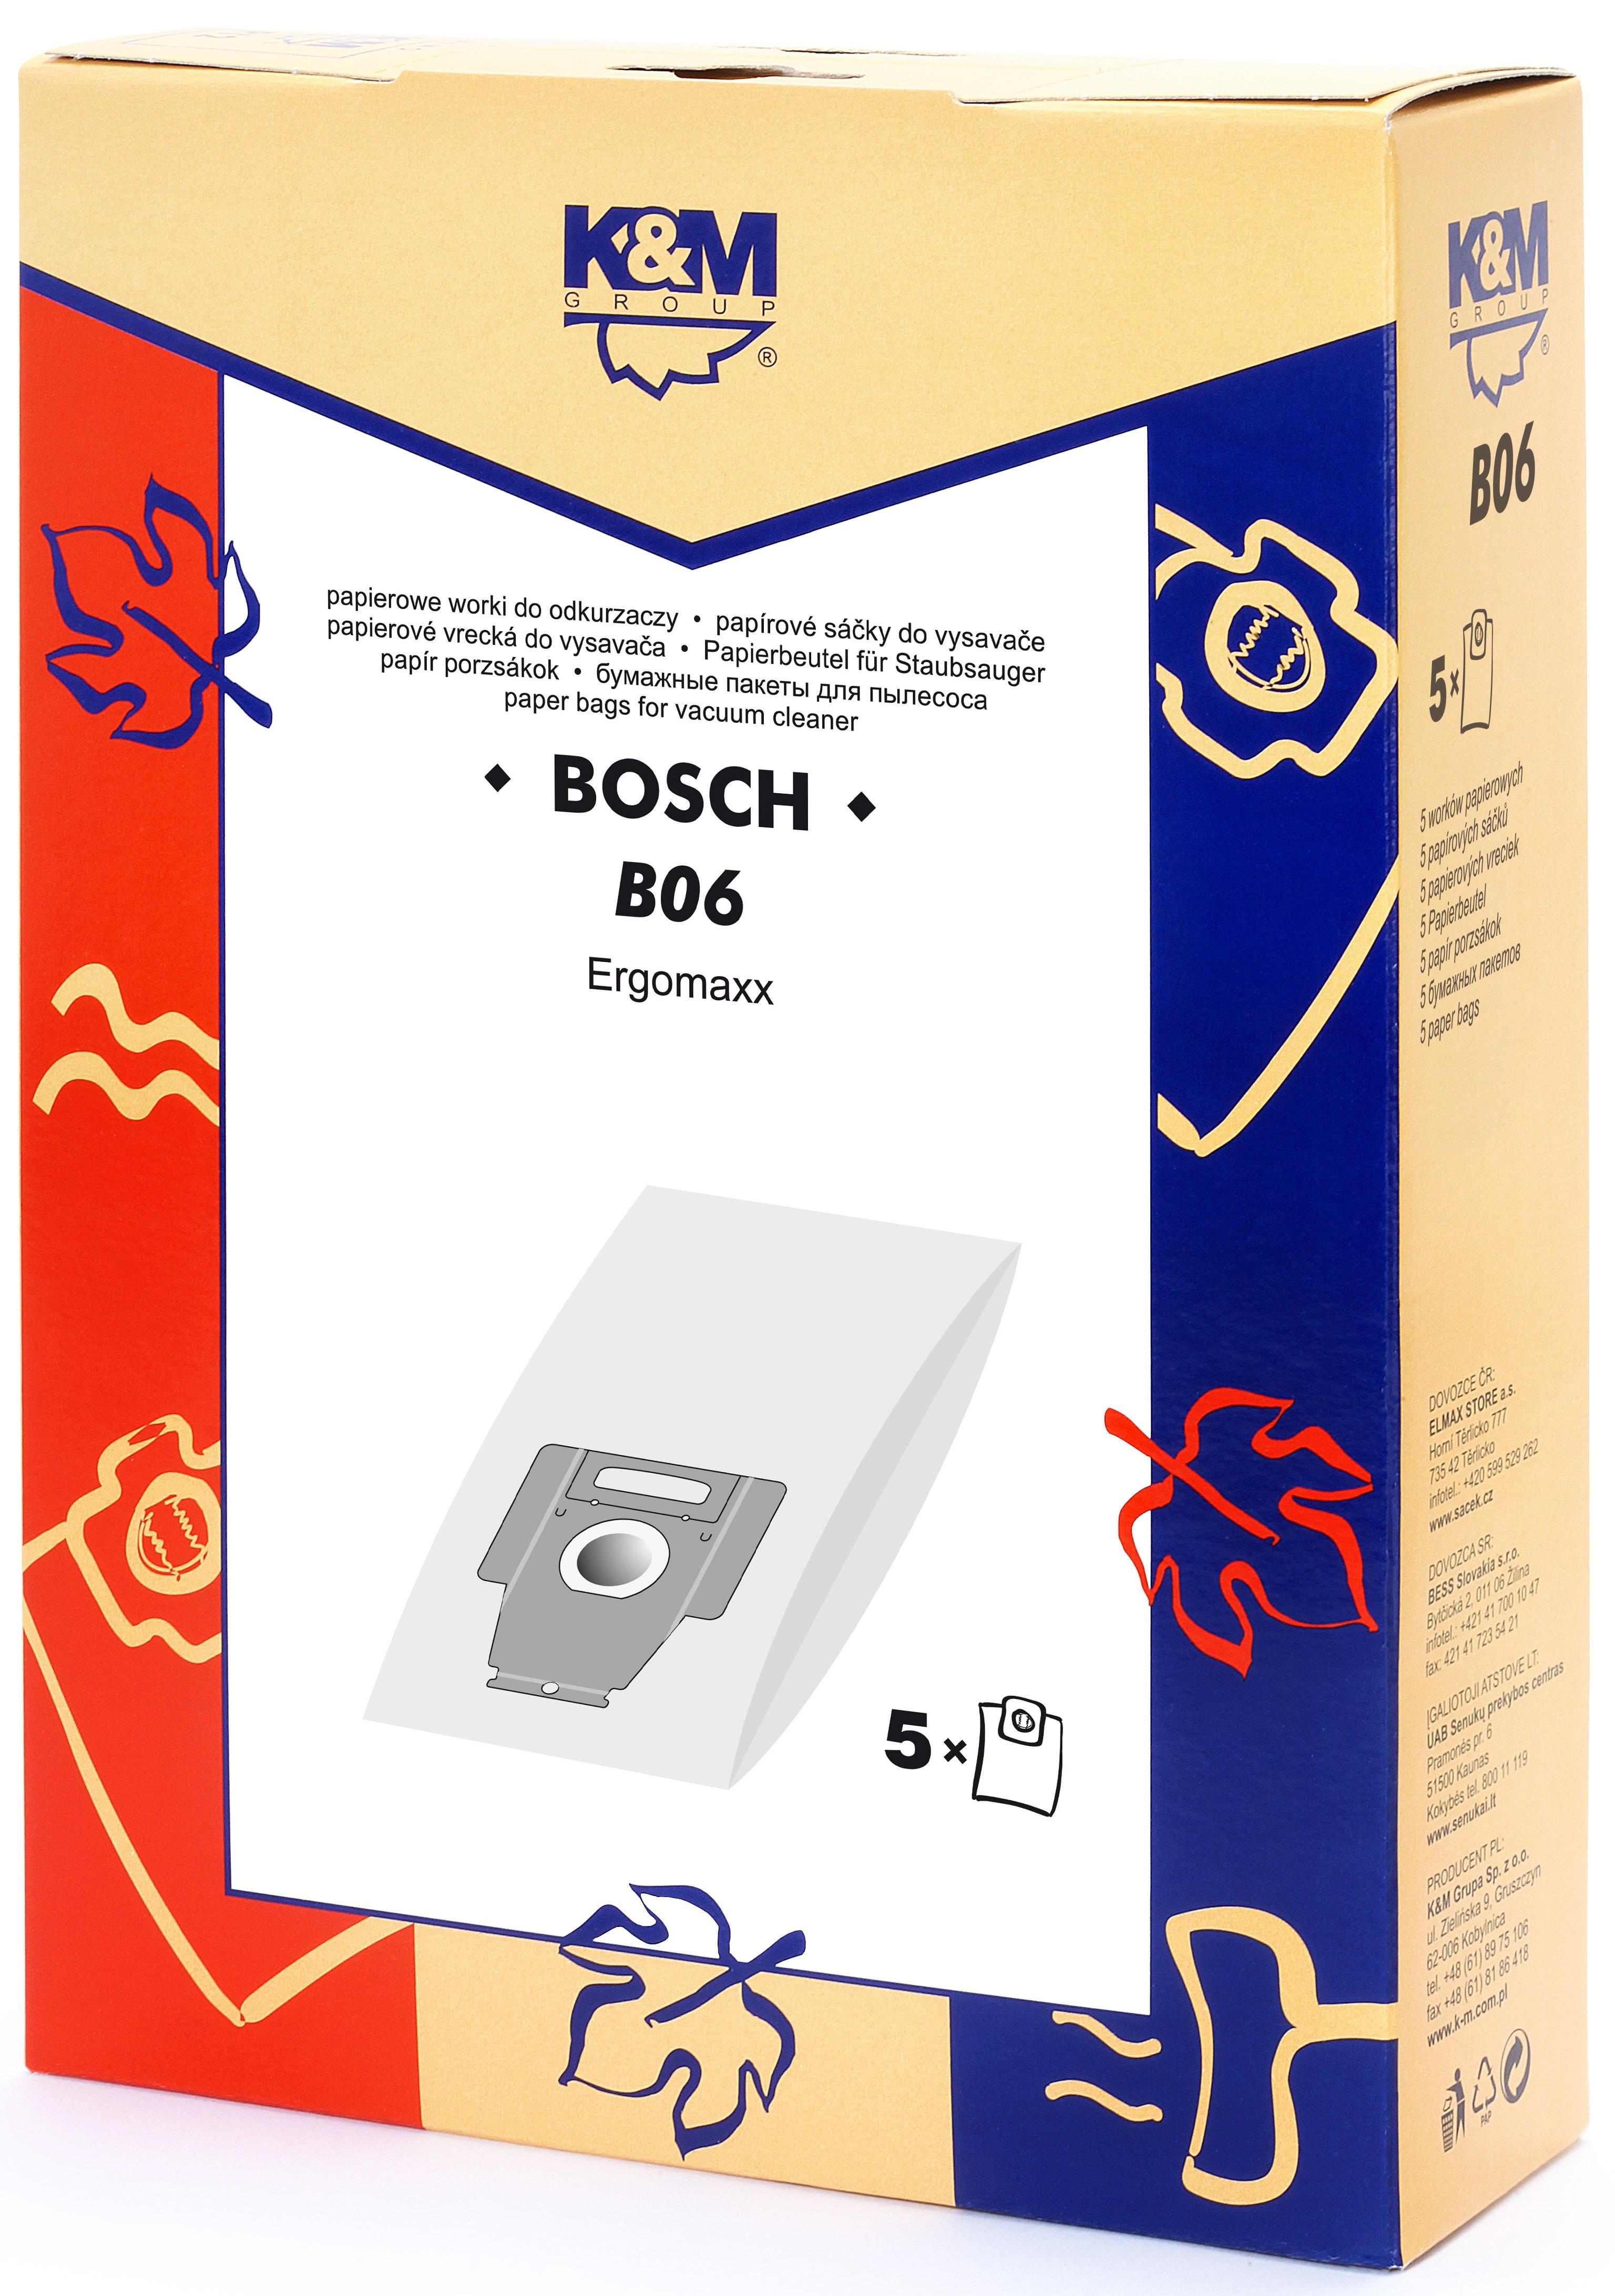 Sac aspirator pentru Bosch typ P, hartie, 5X saci, K&M 0